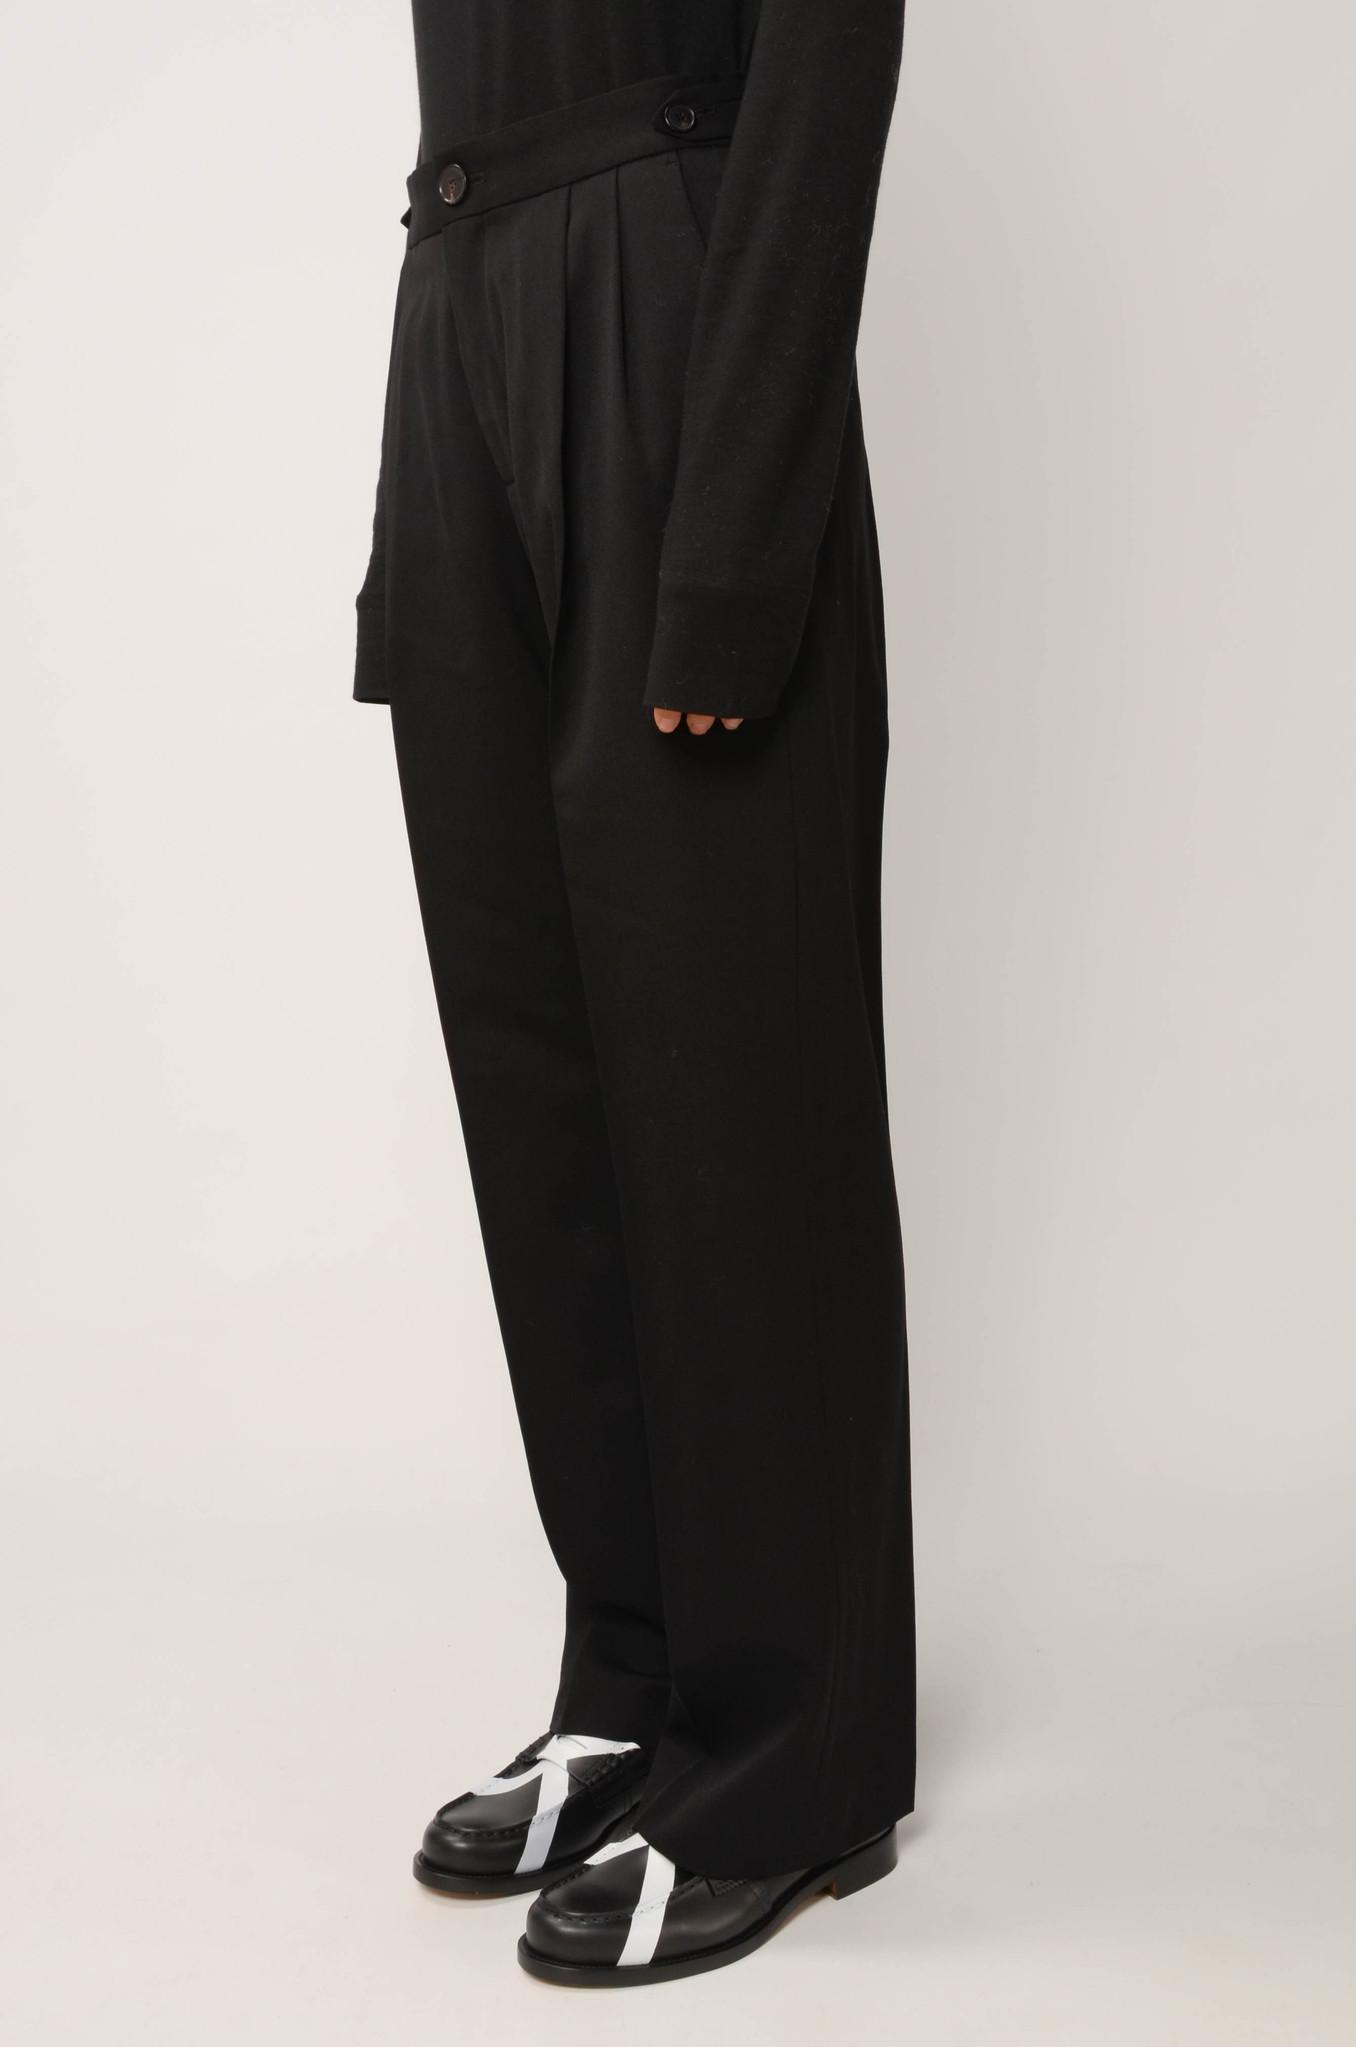 BENTON PANTS IN BLACK-3